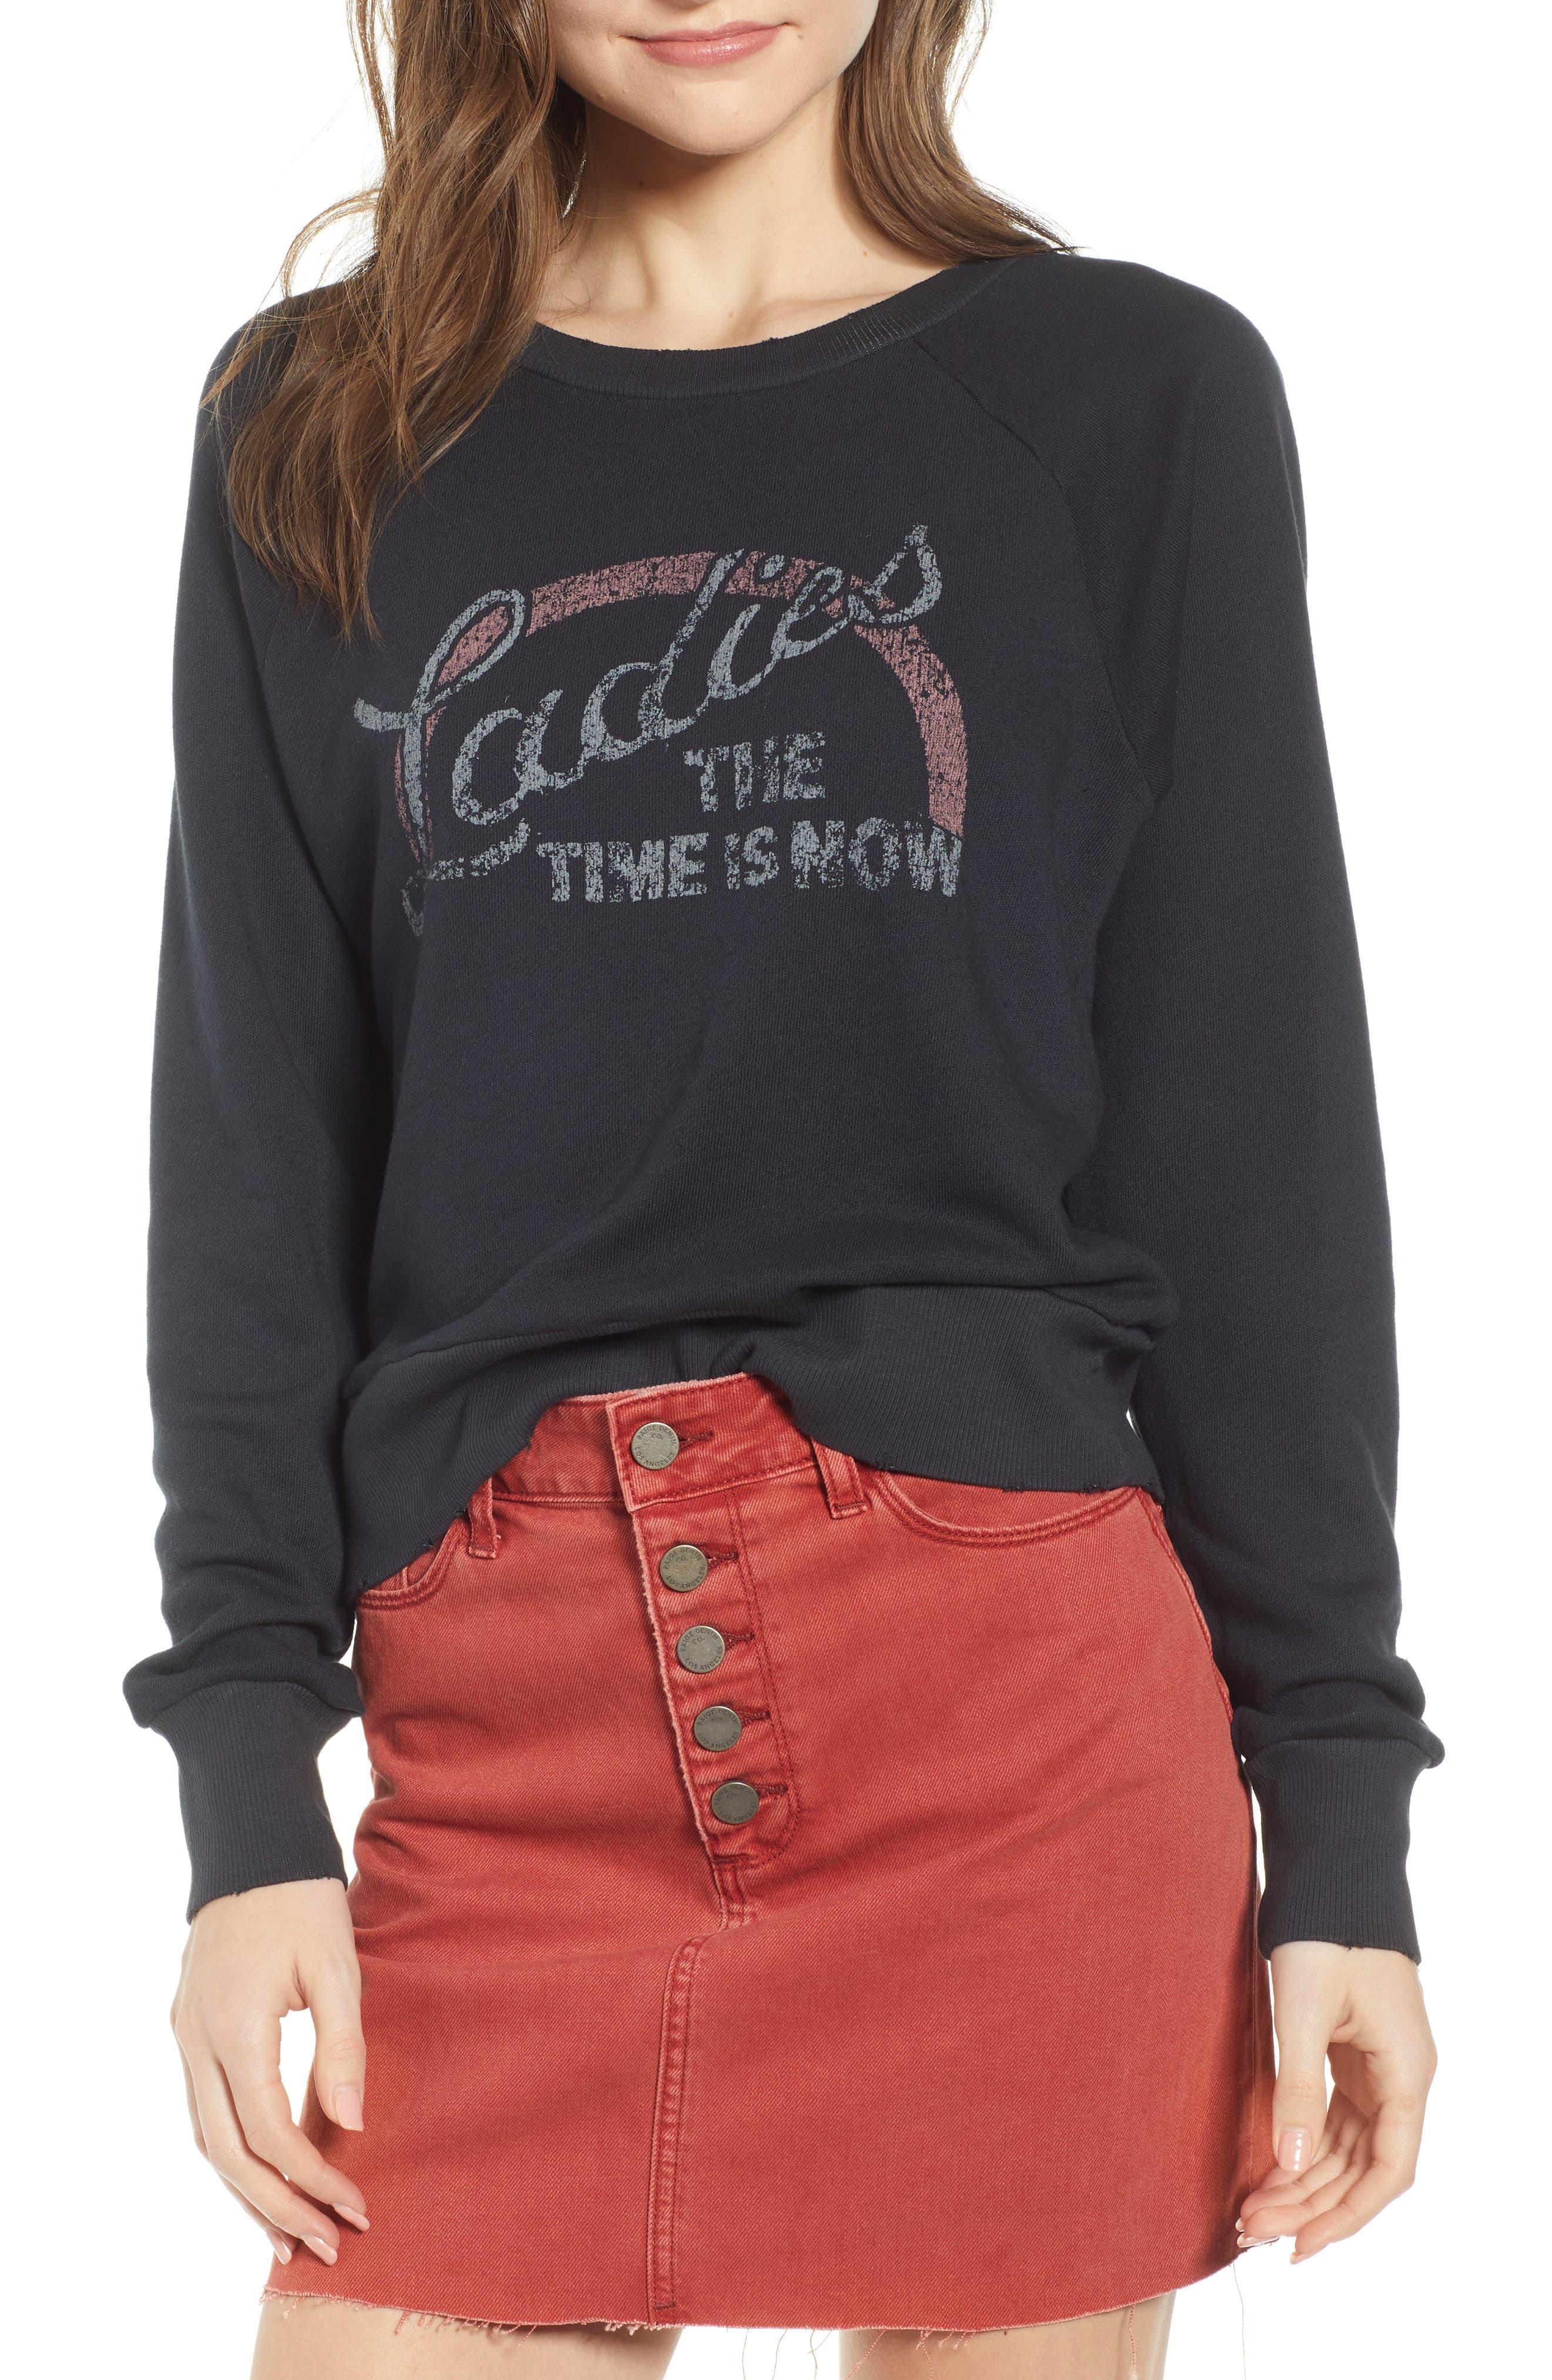 Paige Lizeth Sweatshirt, Black